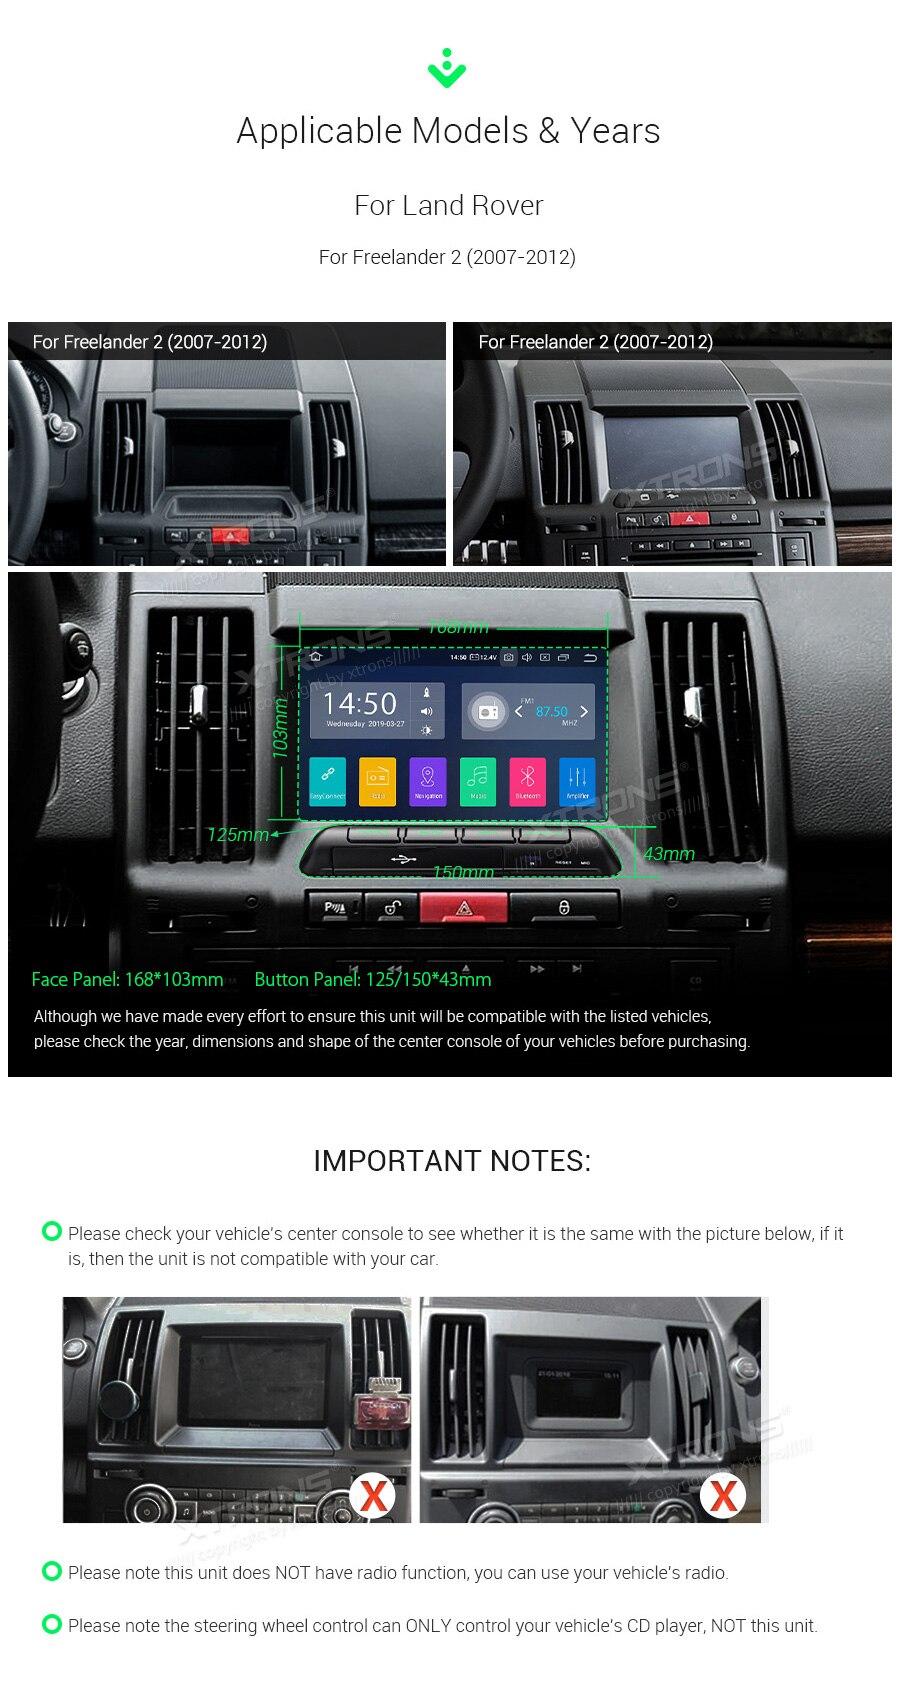 "Excellent 7"" Android 9.0  Car Multimedia Navigation GPS radio for Land Rover Freelander 2 2006 2007 2008 2009 2010 2012 2013 2014 (L359) 2"